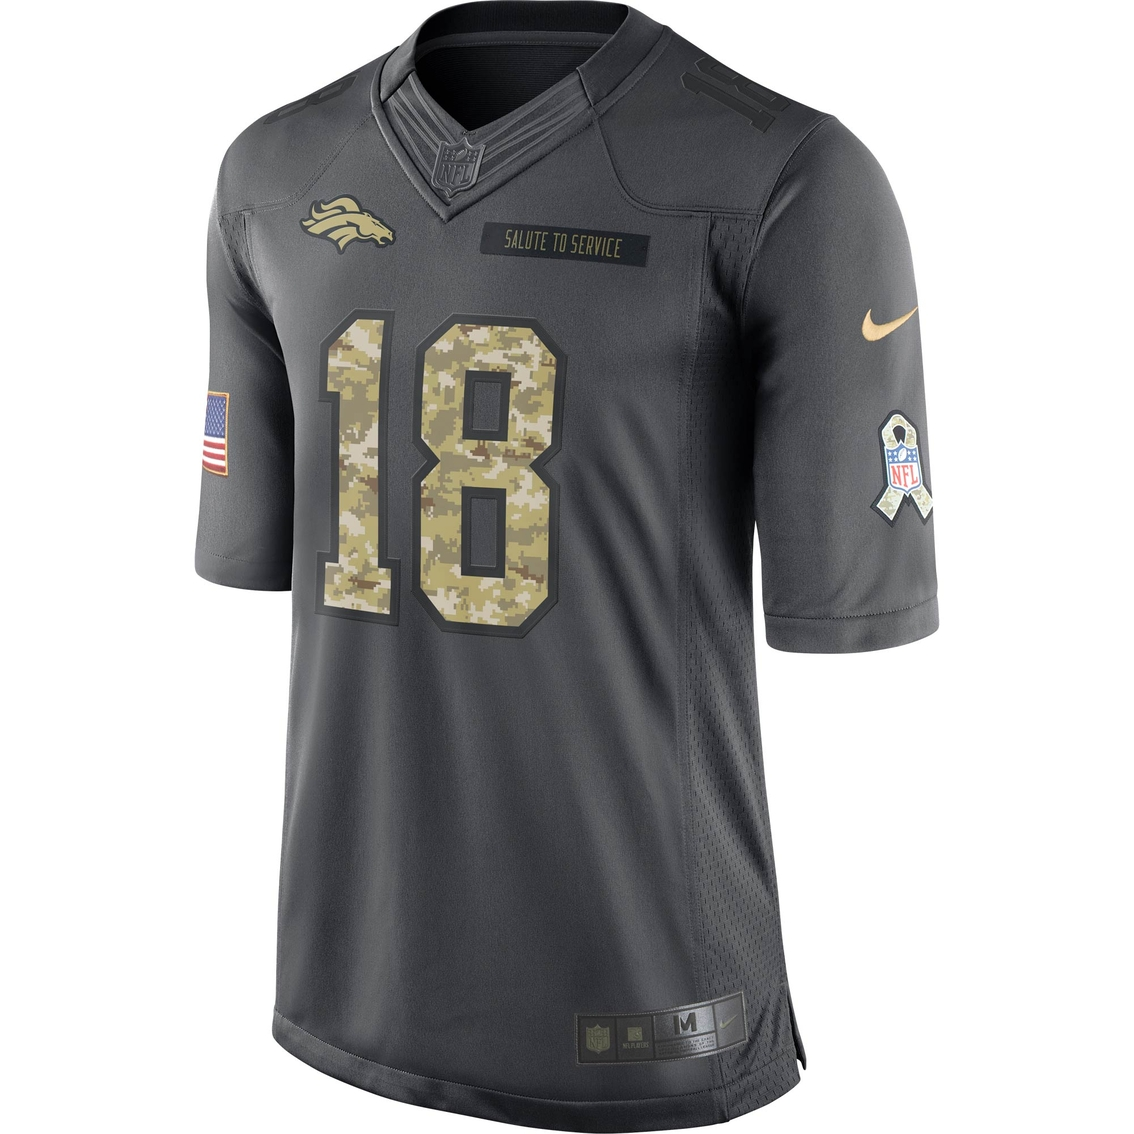 meet 4630c b00ac Nike Nfl Denver Broncos Manning Salute To Service Jersey ...